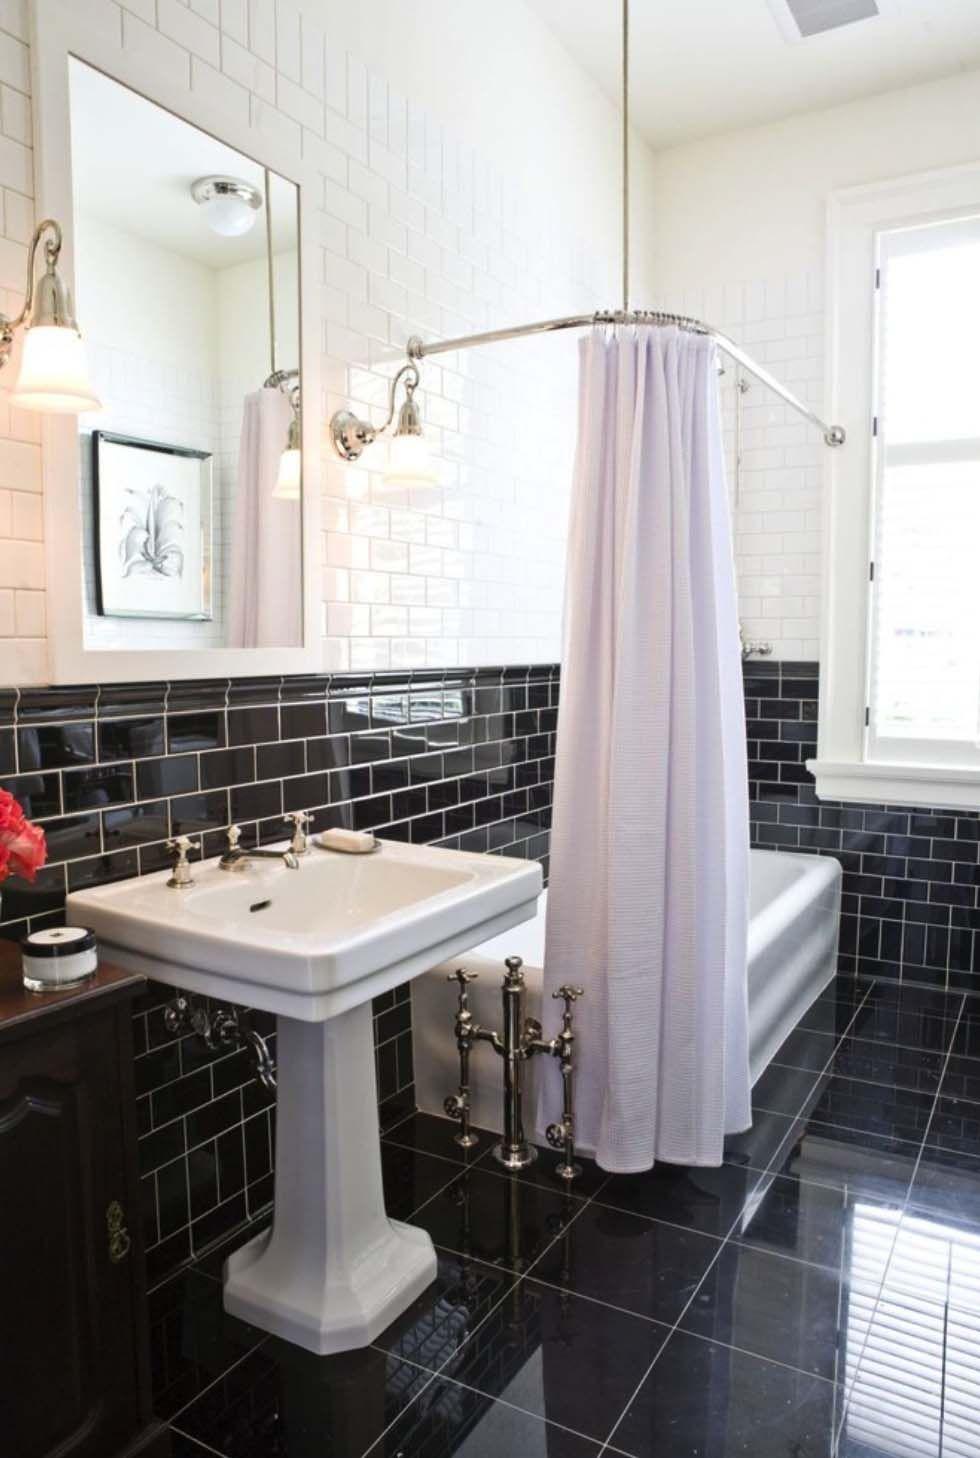 25 Incredibly Stylish Black And White Bathroom Ideas To Inspire Bathrooms Wc White Bathroom Tiles White Bathroom Decor Black White Bathrooms